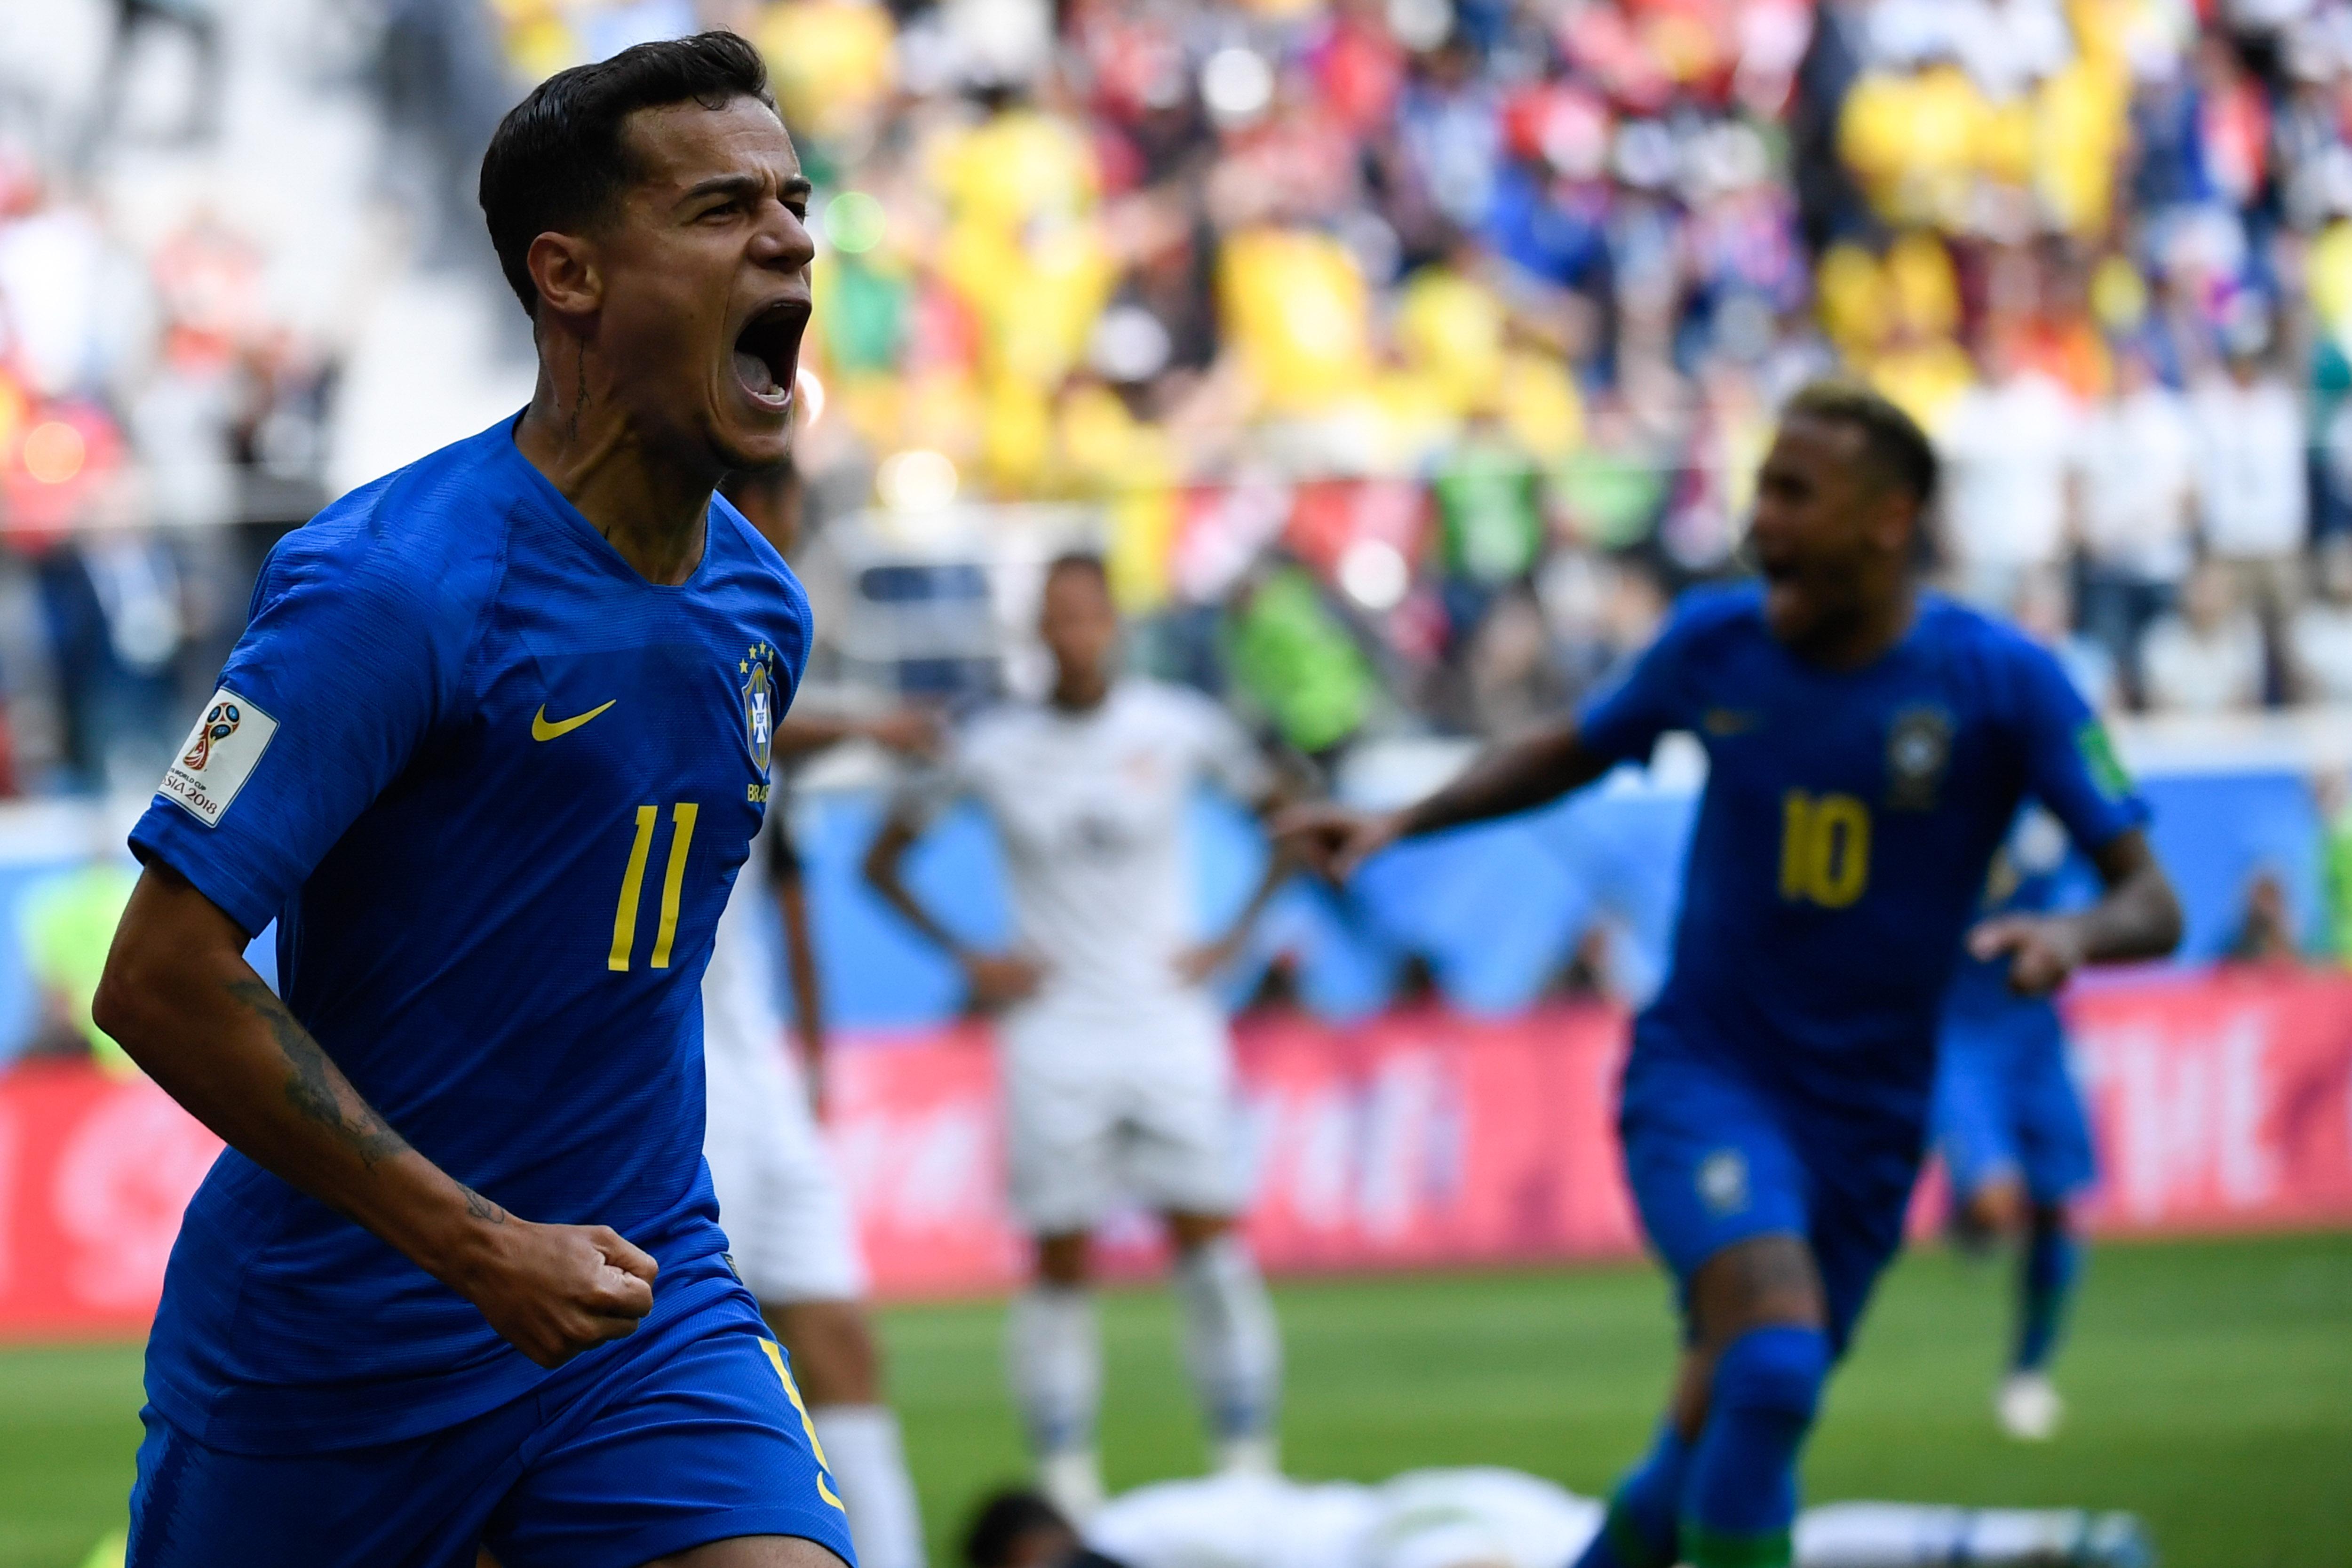 Filipe Coutinho la metió al final